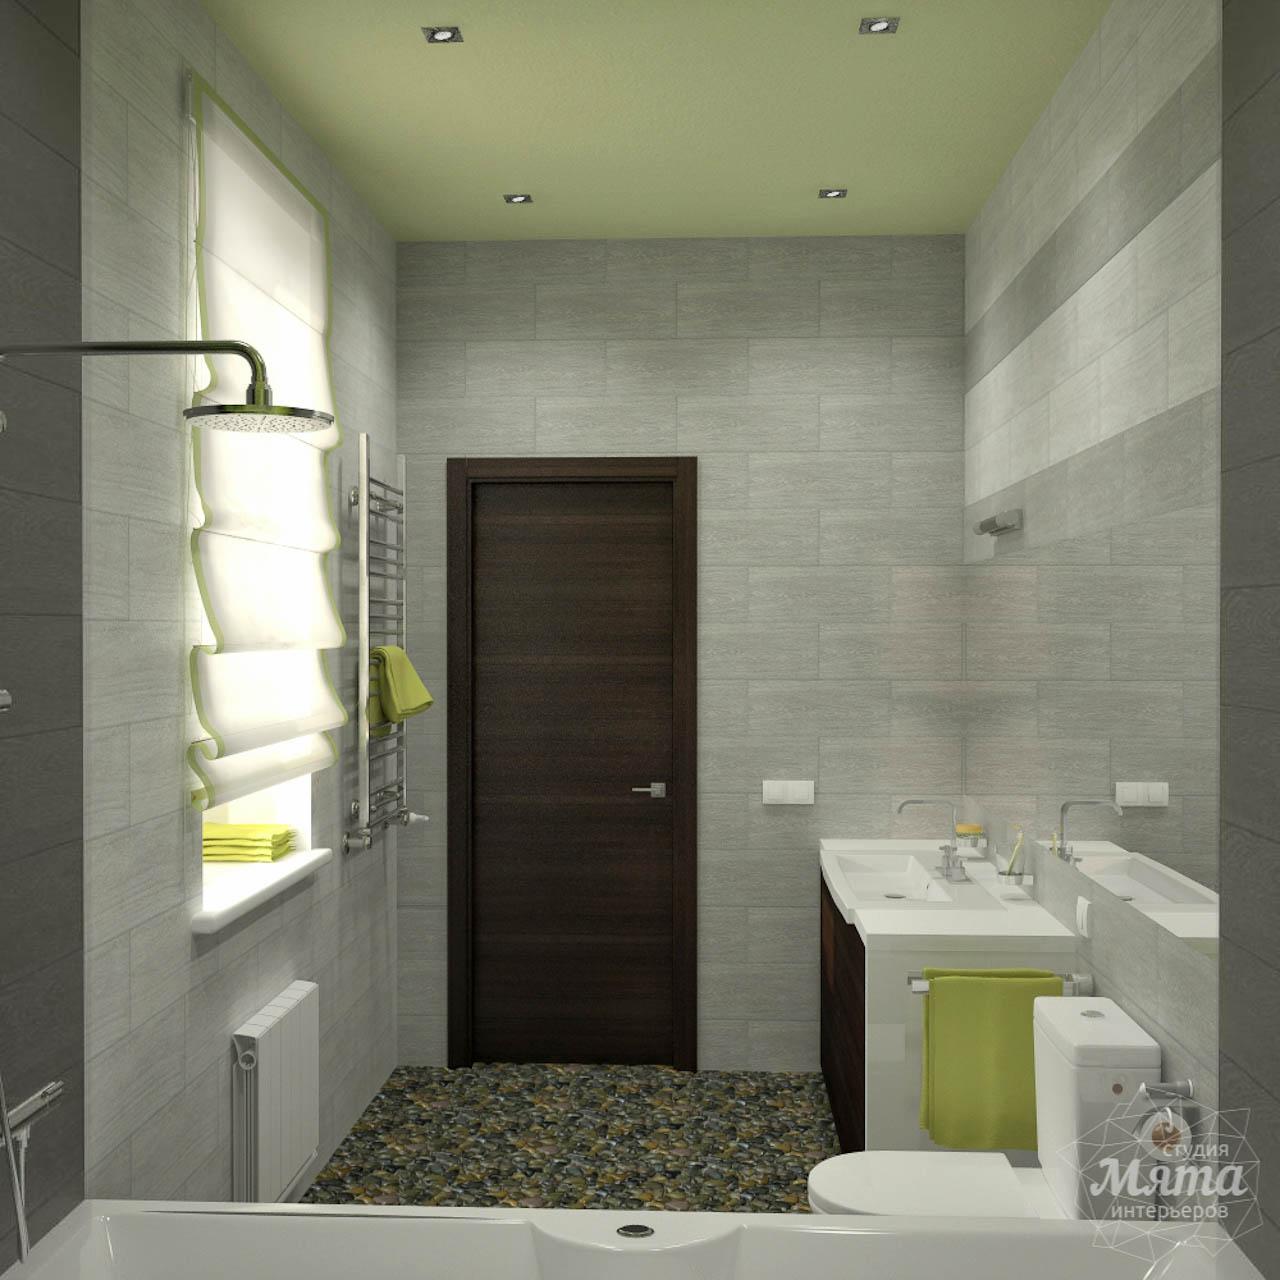 Дизайн проект интерьера коттеджа  в стиле минимализм по ул. Барвинка 15 img945403294